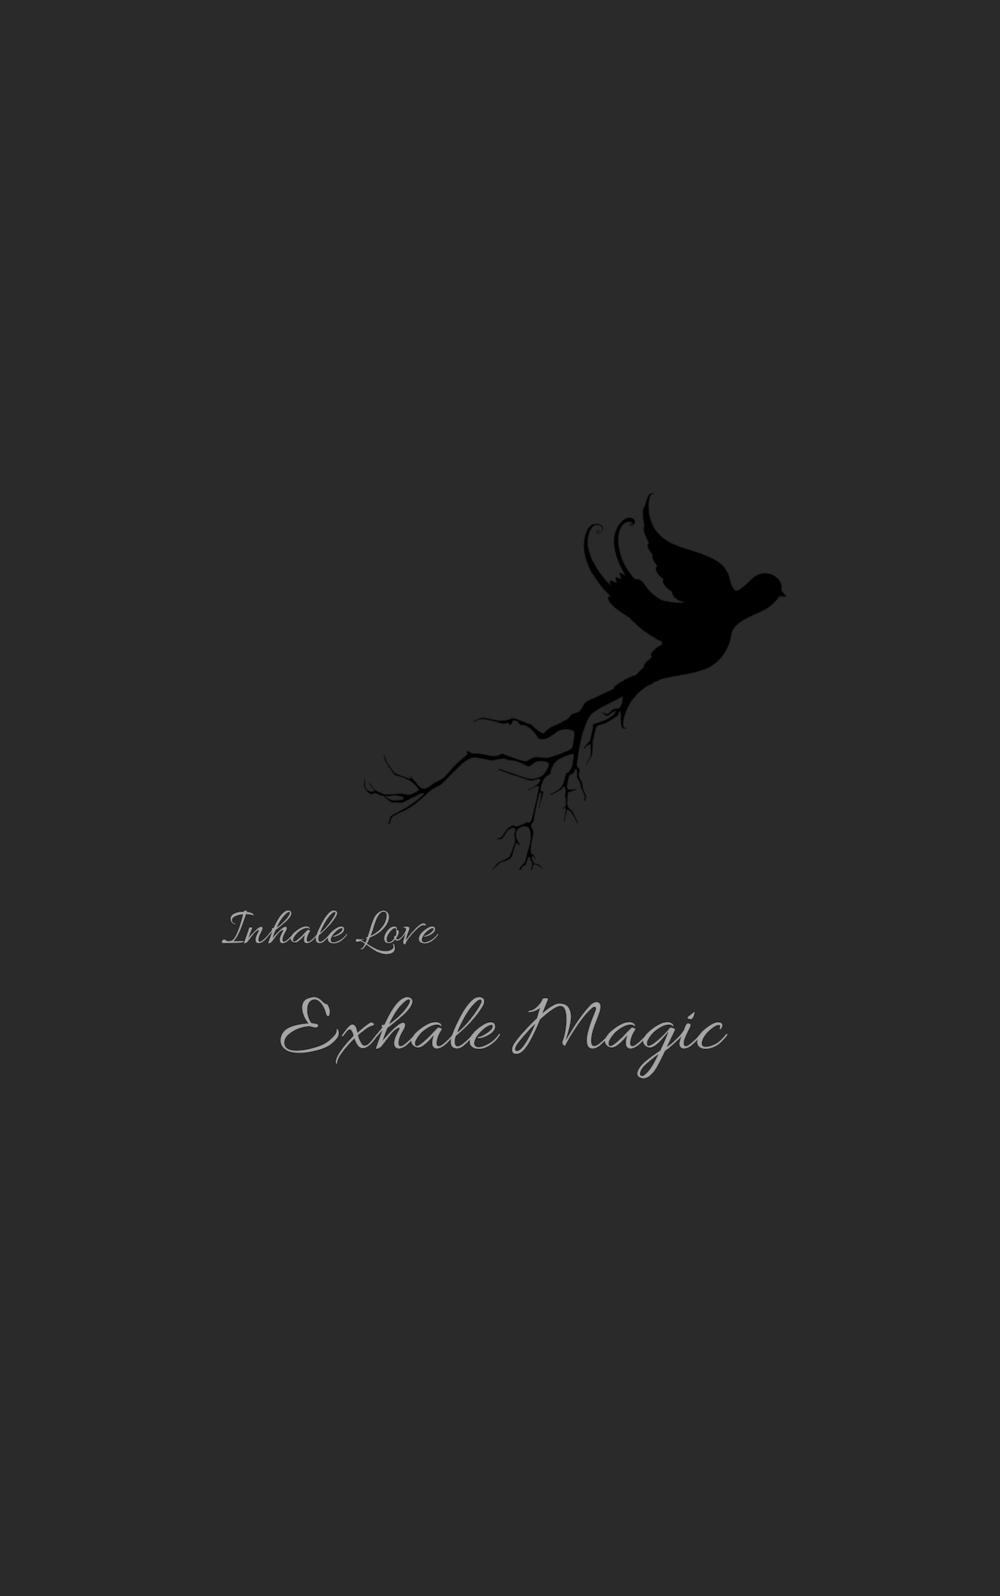 Inhale Love Exhale Magic, By Hillary Wen